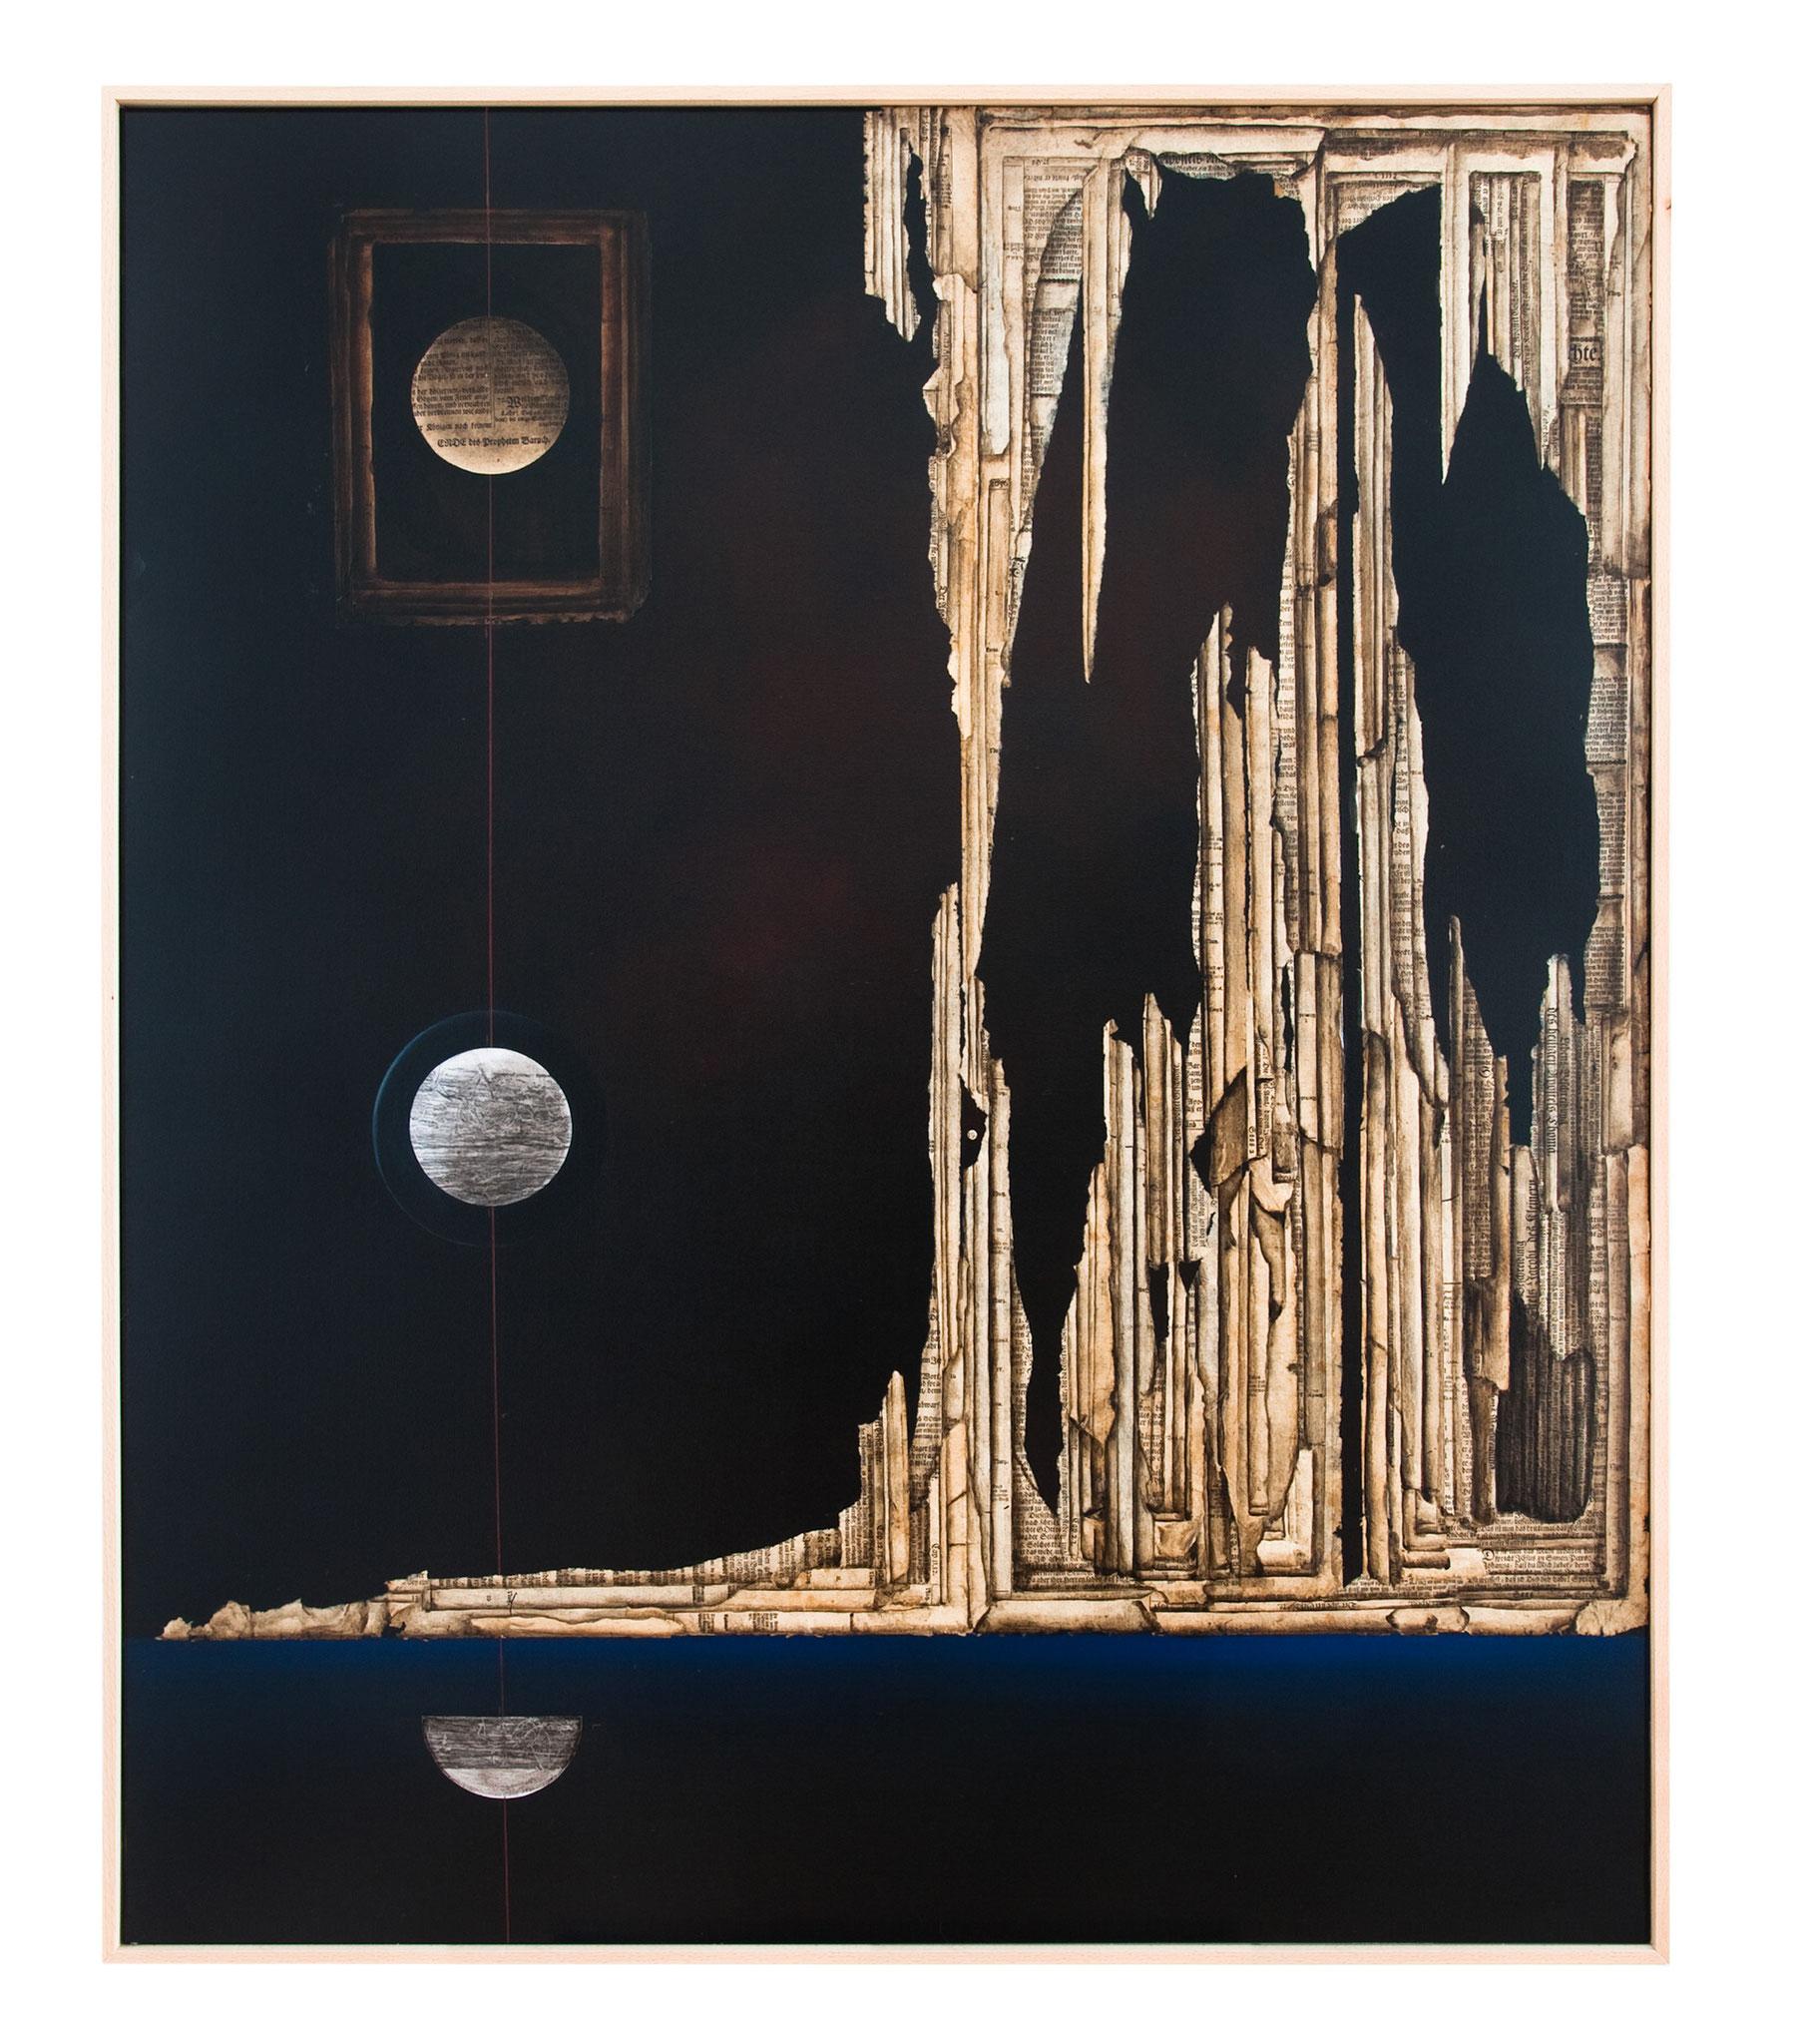 ZEIT (T) RAUM IV - - 2013 - Acryl, Tusche, Papier auf Leinwand  - 122 x102 cm